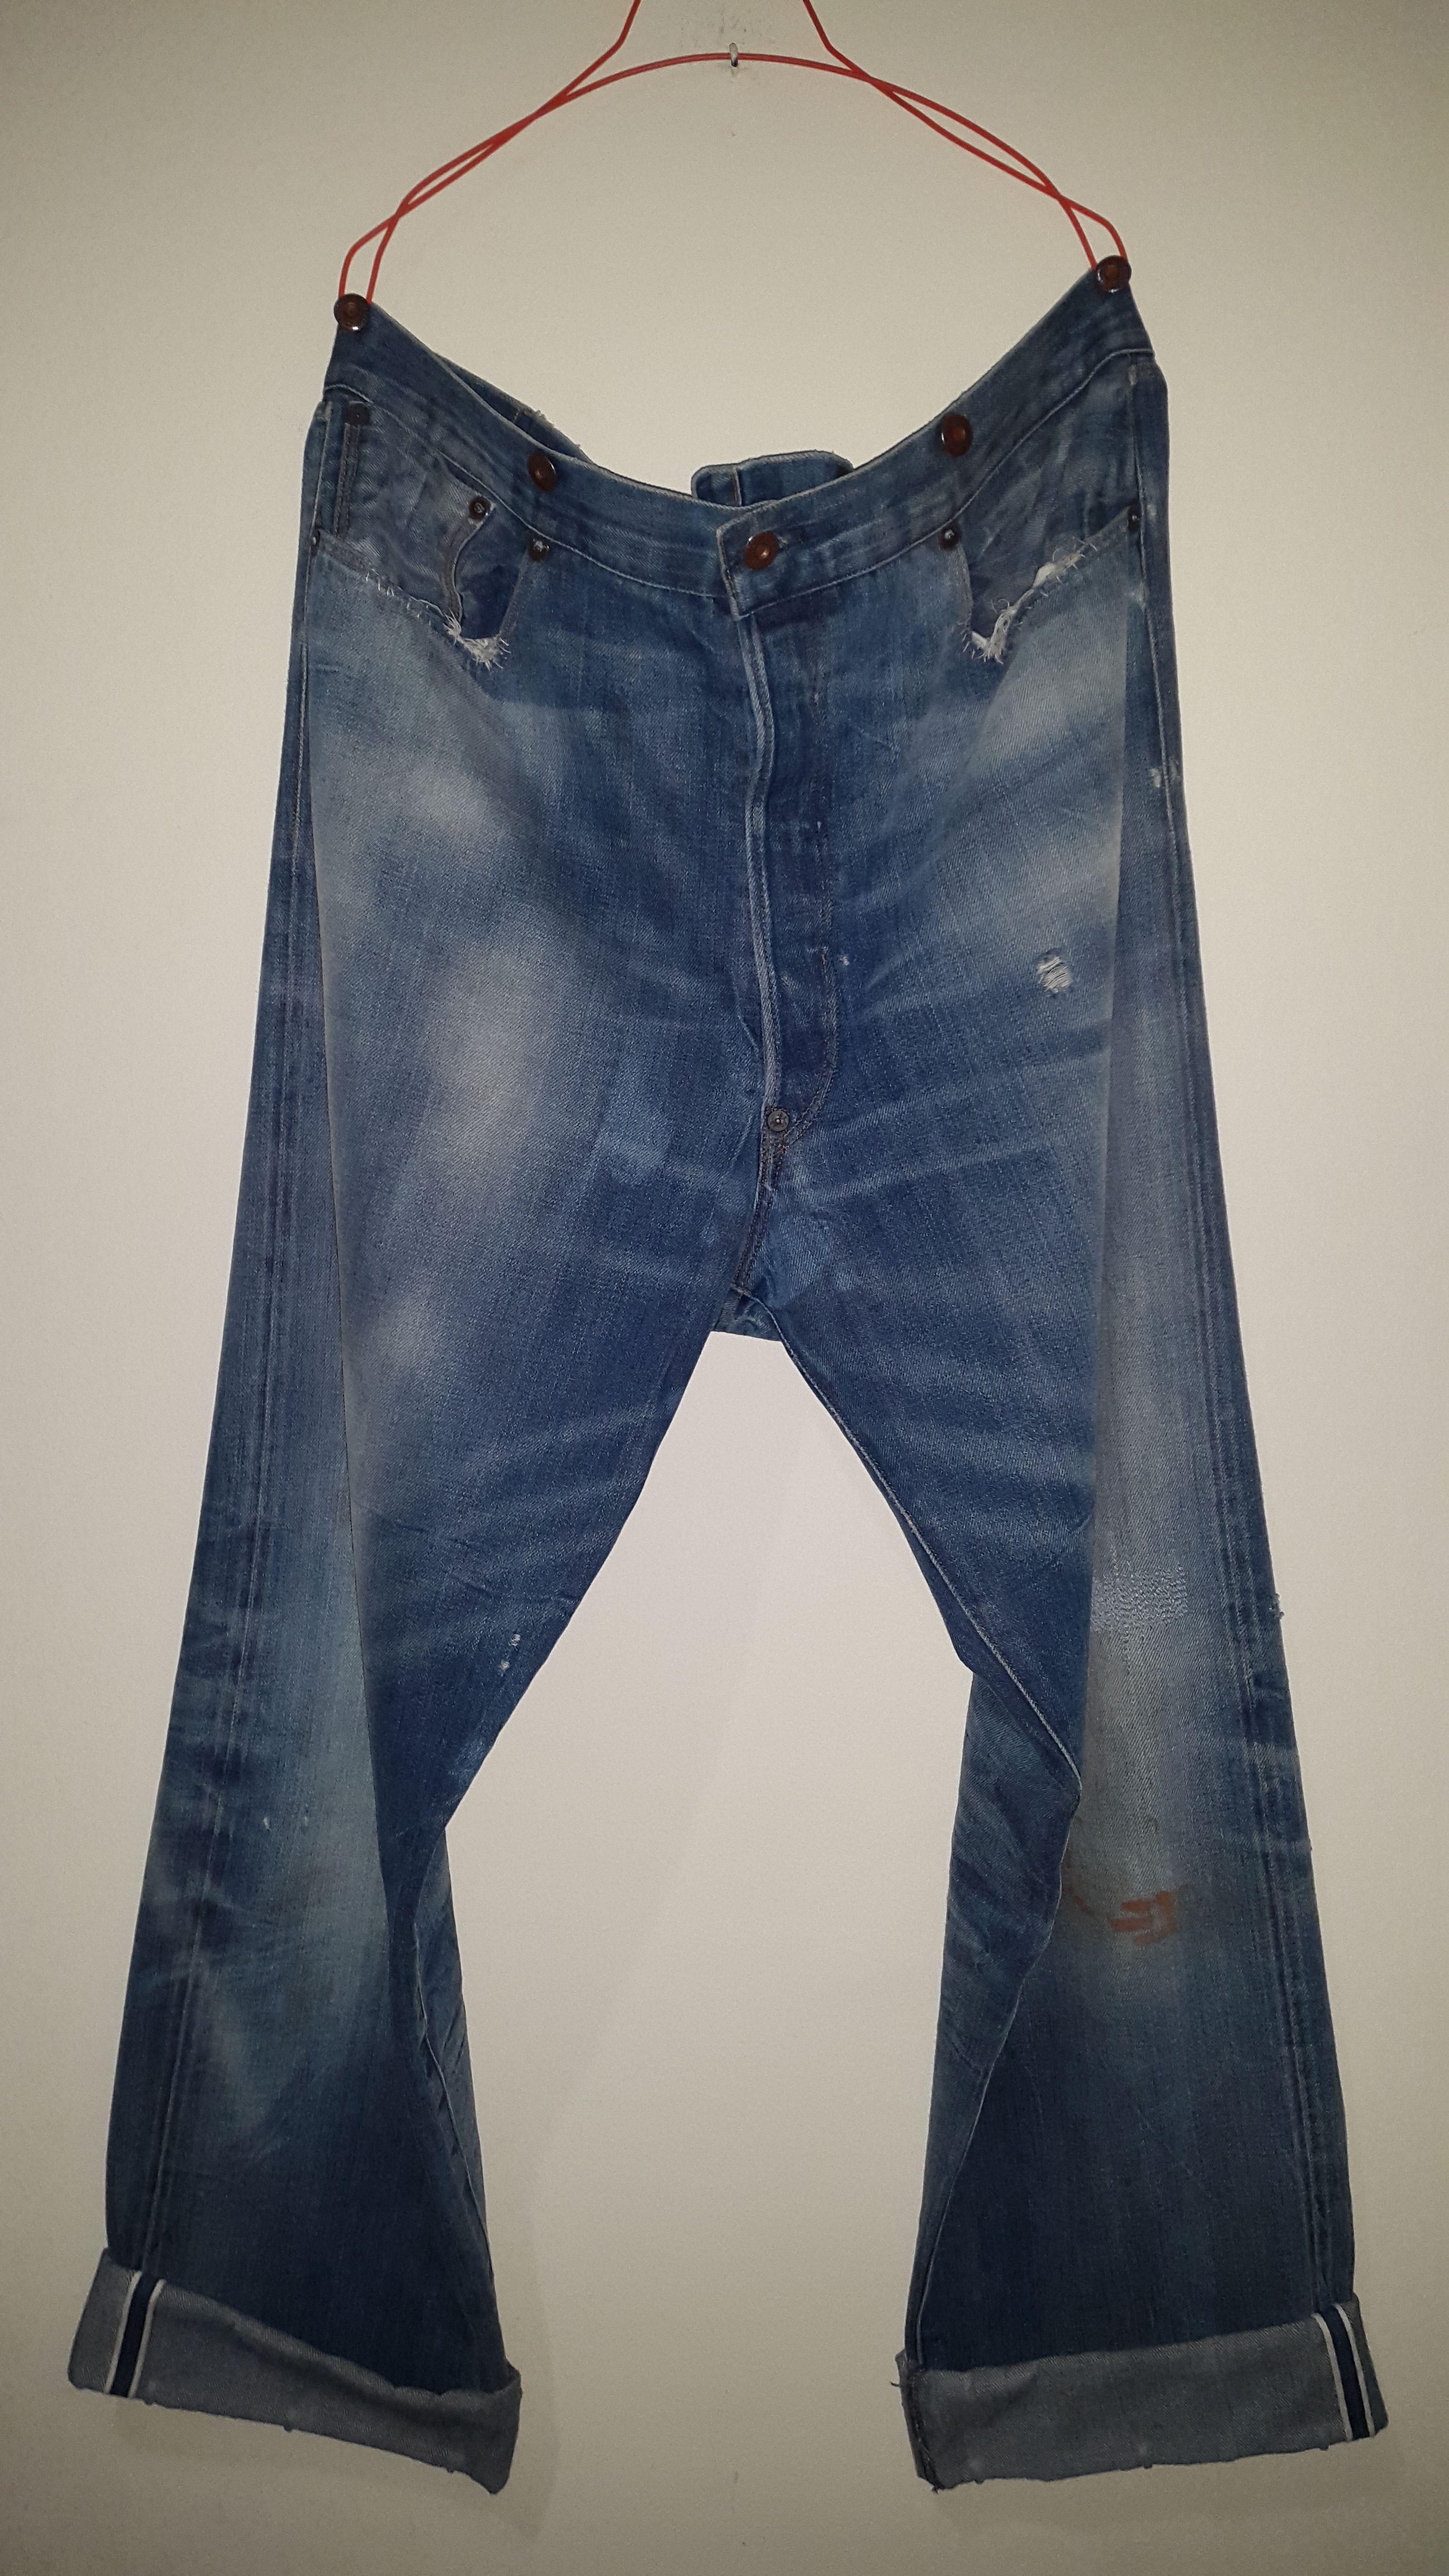 5fa9513fb92 ... Levi's Vintage Clothing Jeans - LVC oleh Andries Mamahit. LVC xx501  1890 barnyard - front side